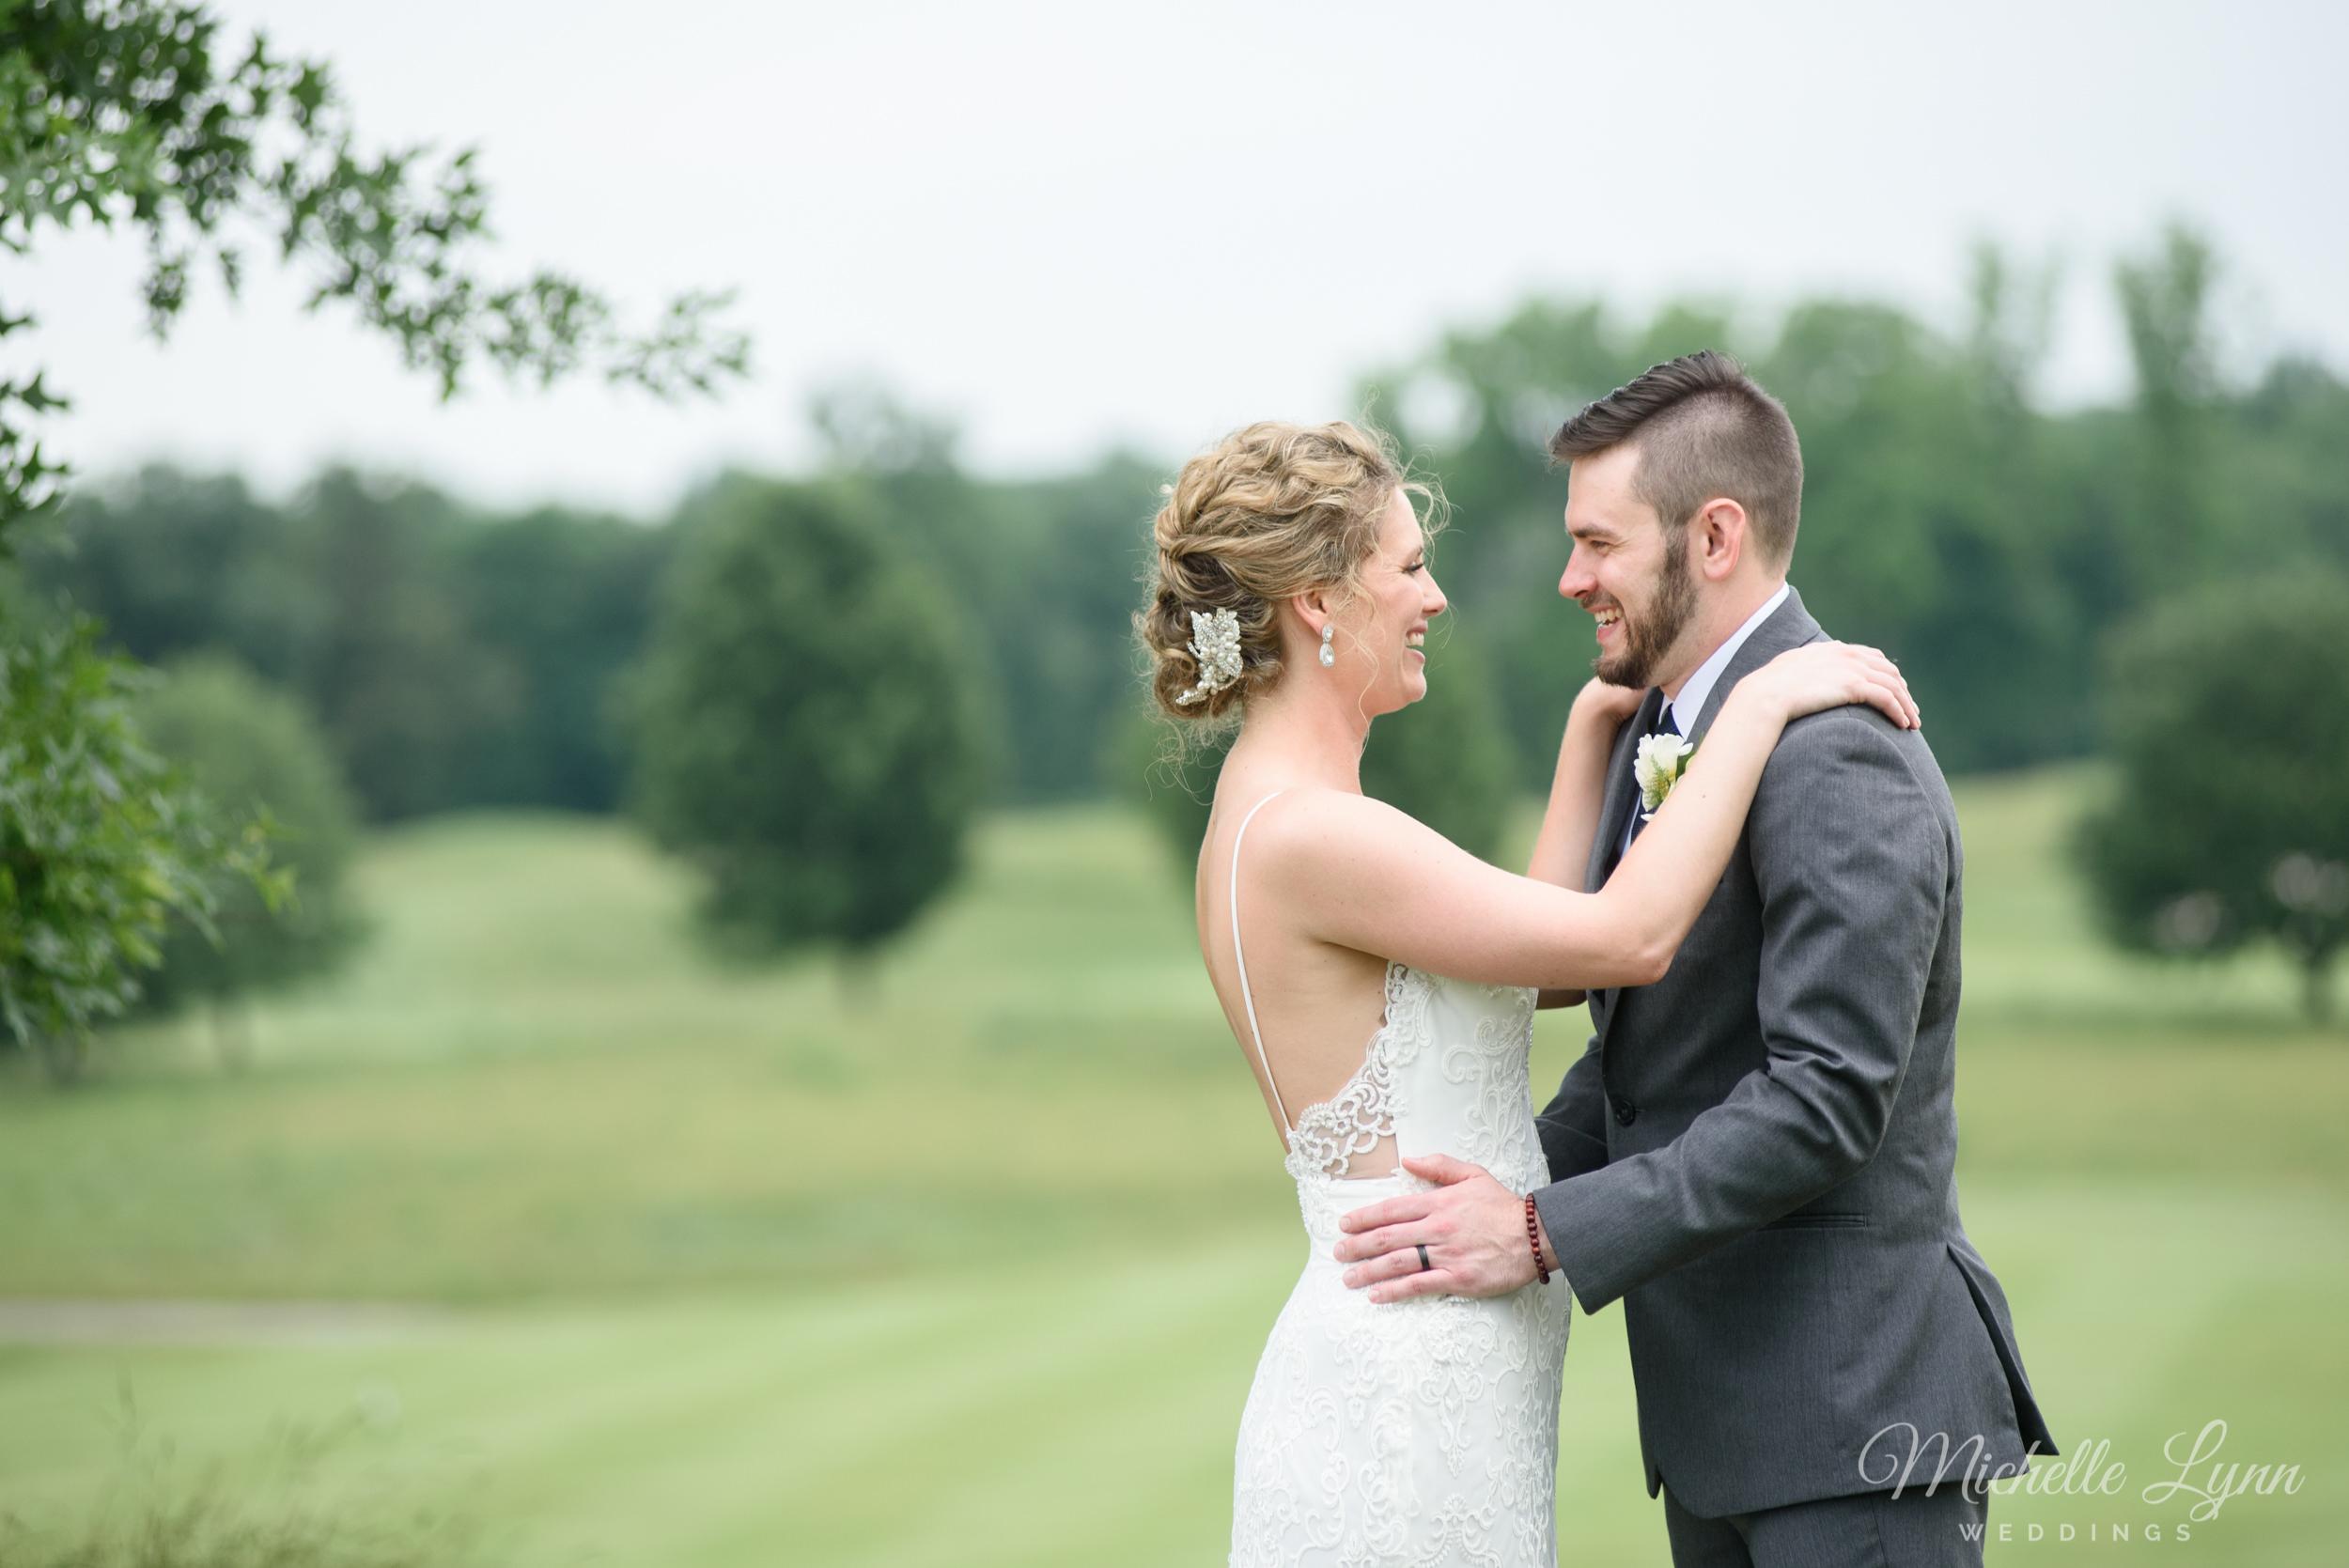 mlw-jericho-national-golf-club-wedding-photography-42.jpg